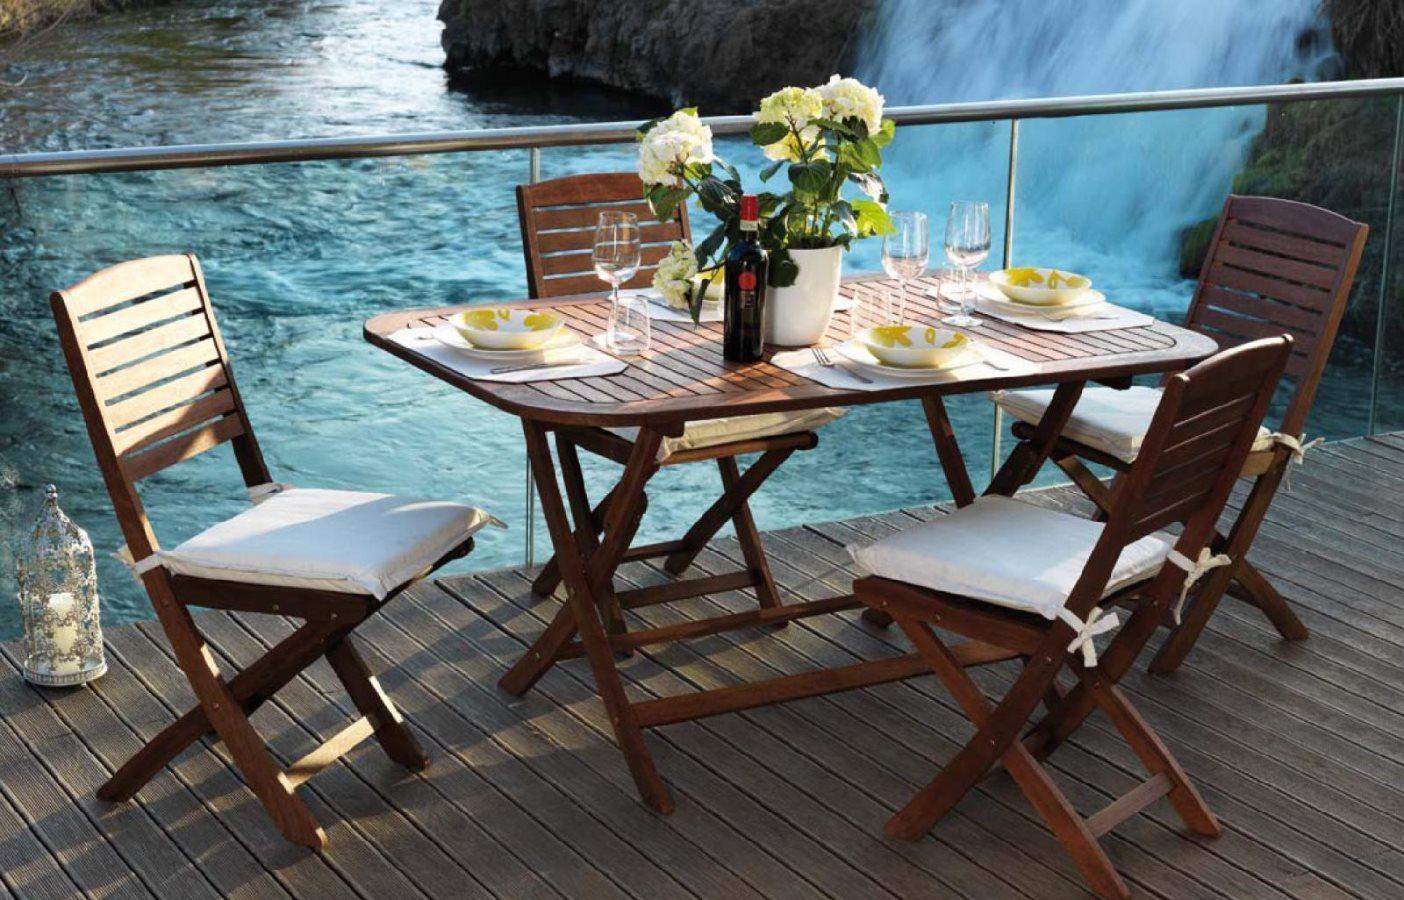 Tavoli Da Giardino Risparmio Casa : Tavolo da giardino in legno flower 150x90x74h arredo giardino e